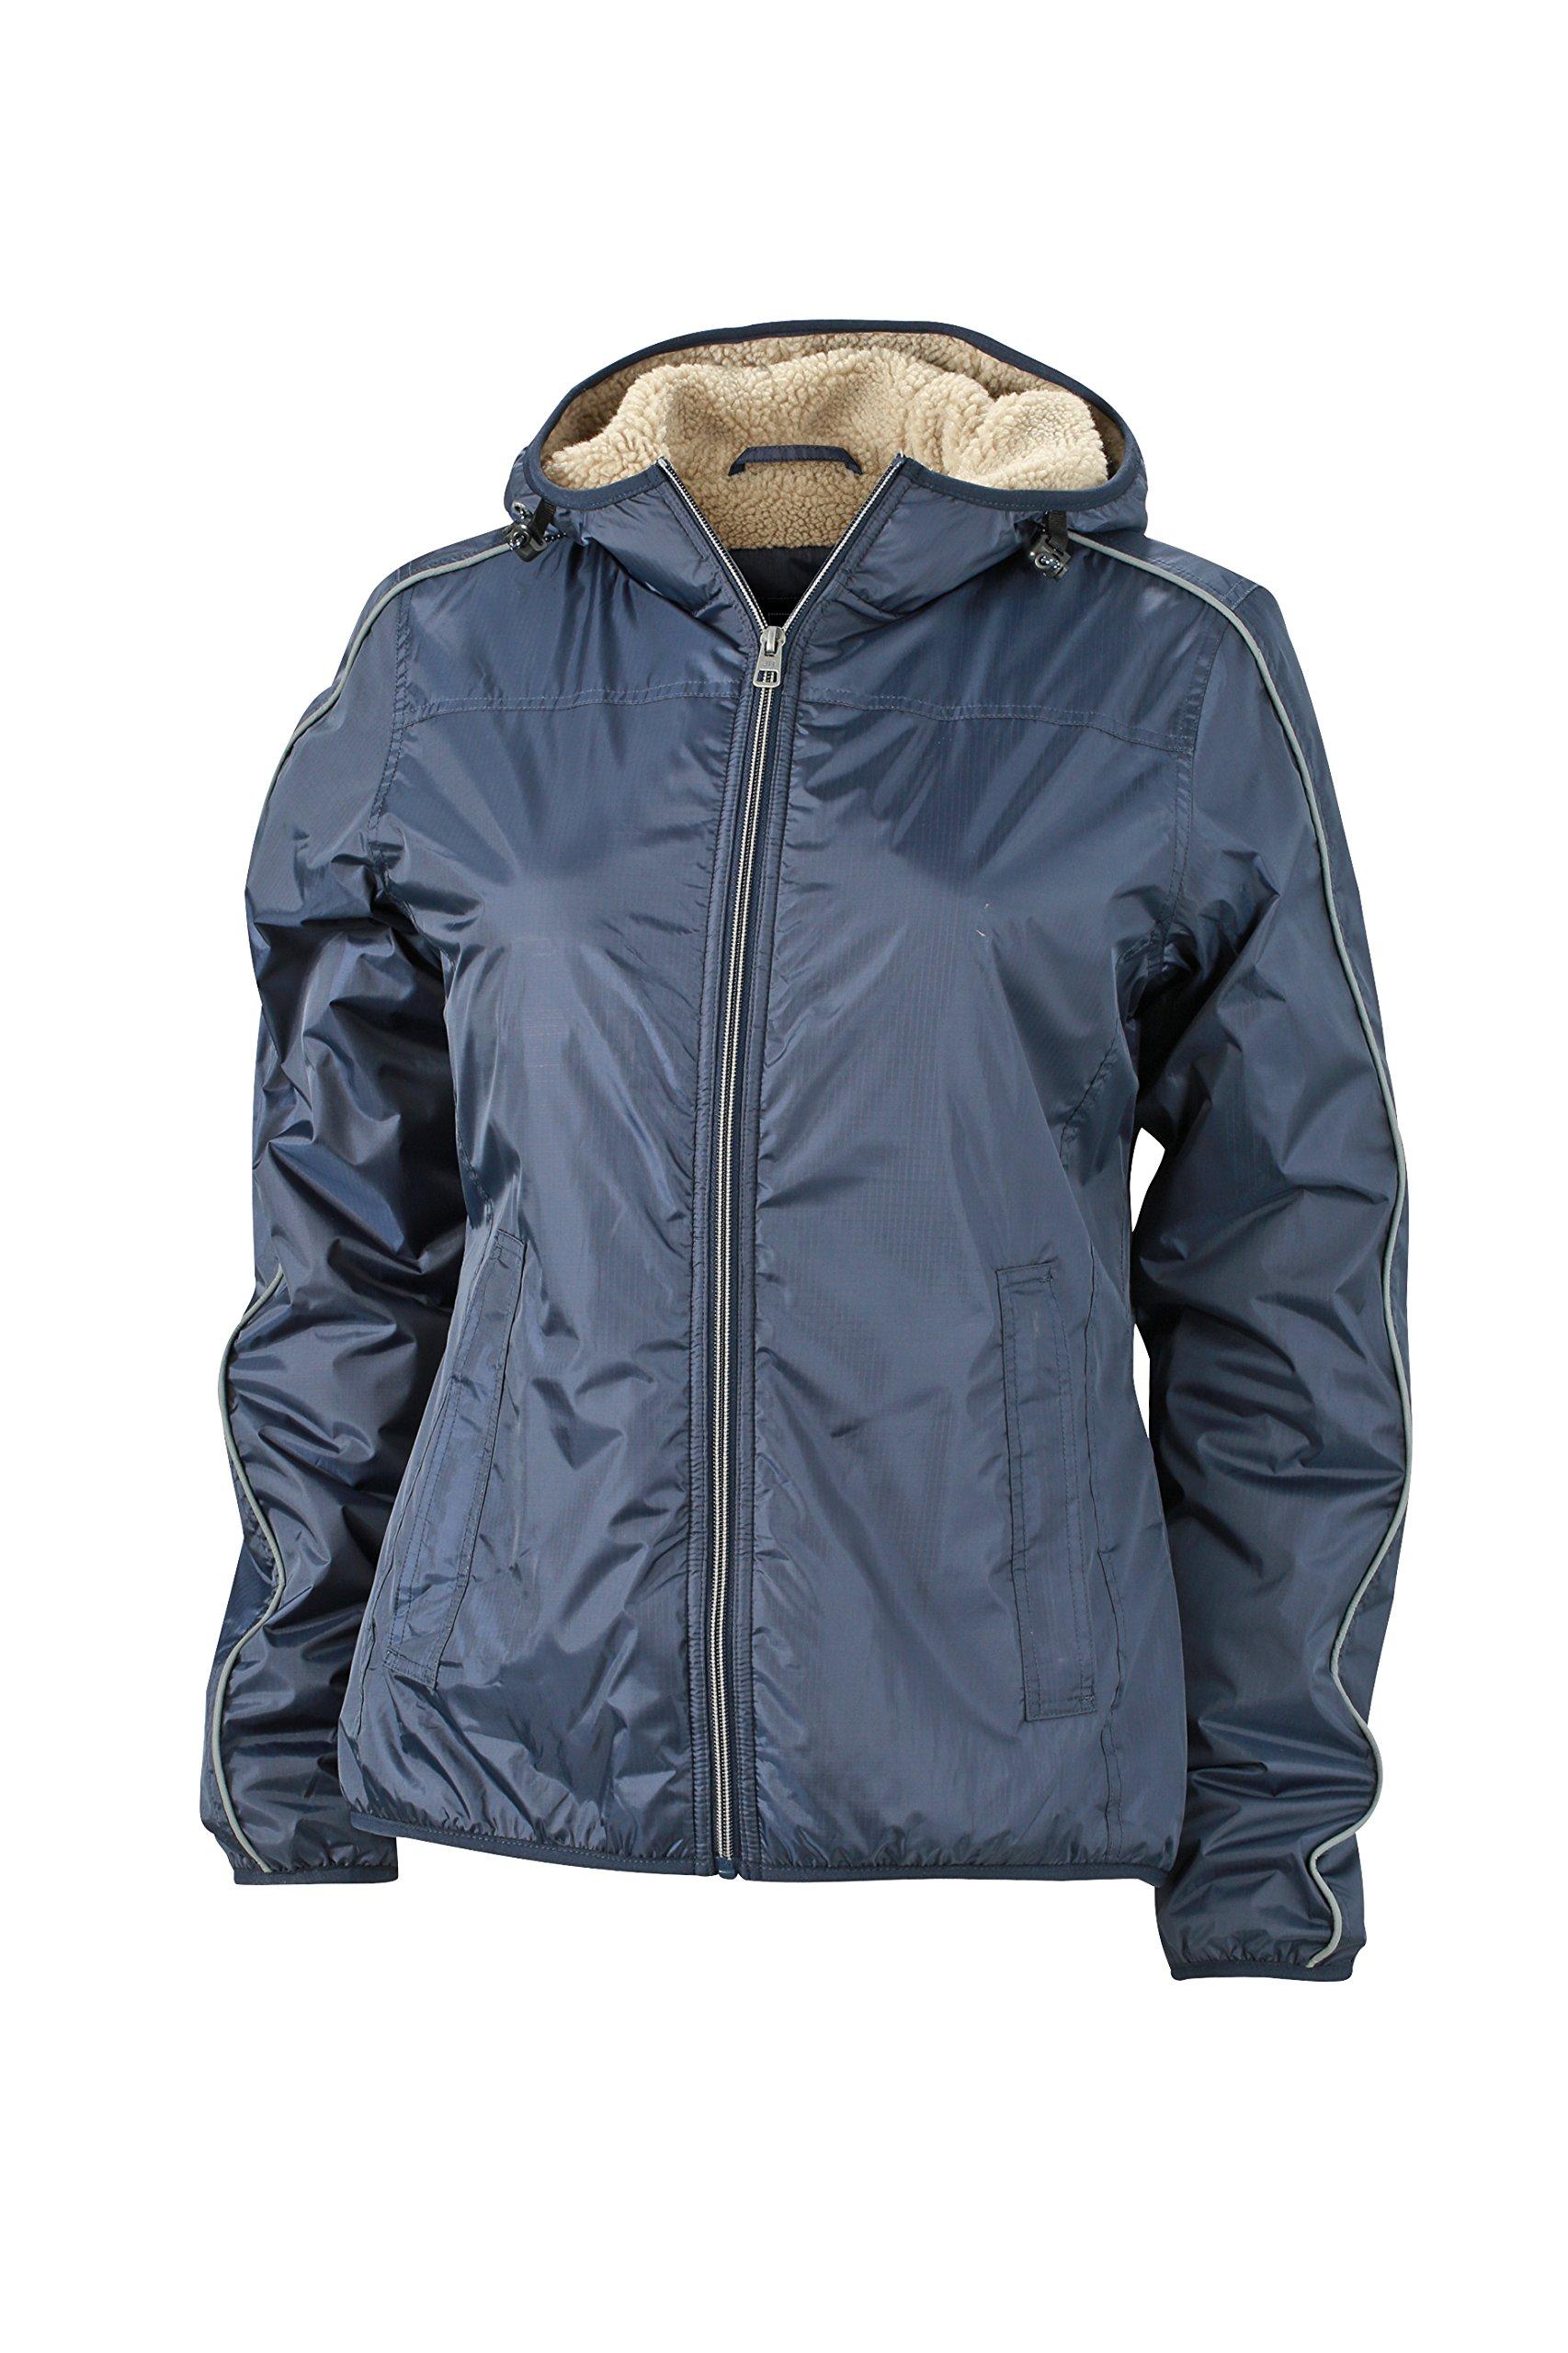 Jacke FabricantX Winter Jamesamp; cameltaille Sports FemmeBleunavy large Blouson Jacket Nicholson m8w0Nn